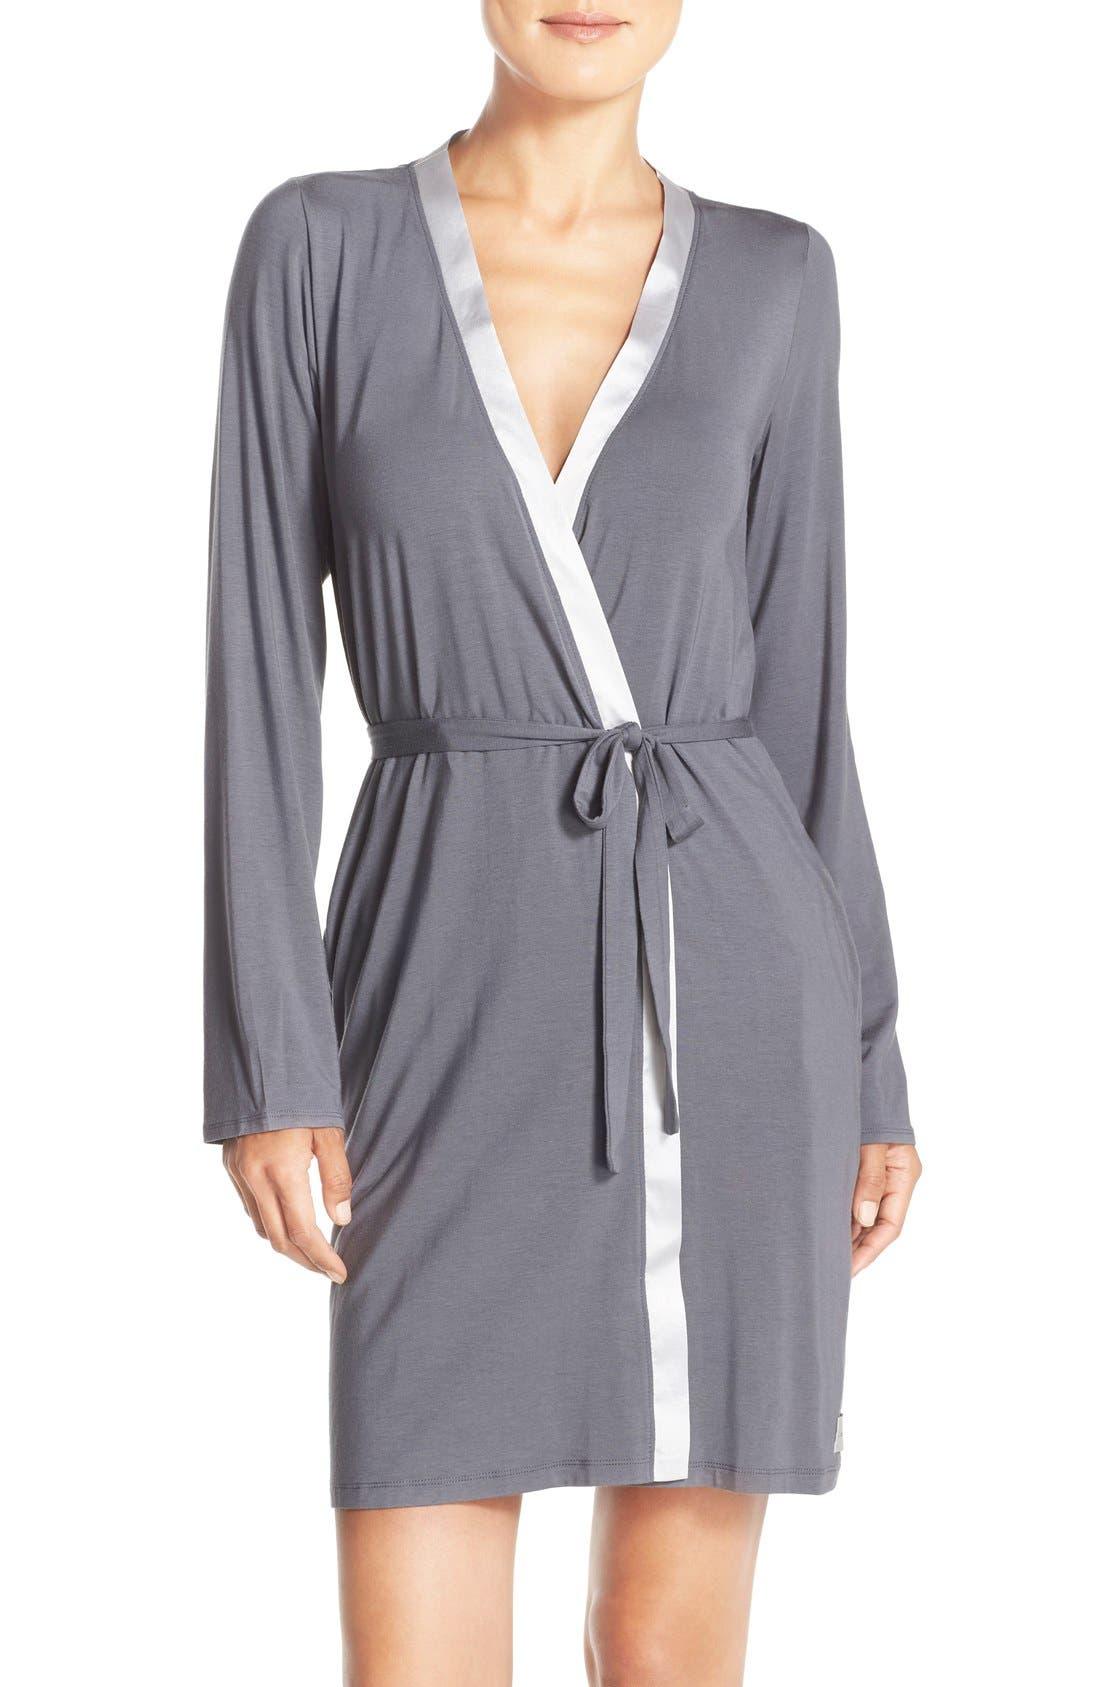 Alternate Image 1 Selected - Calvin Klein 'Essentials' Short Robe